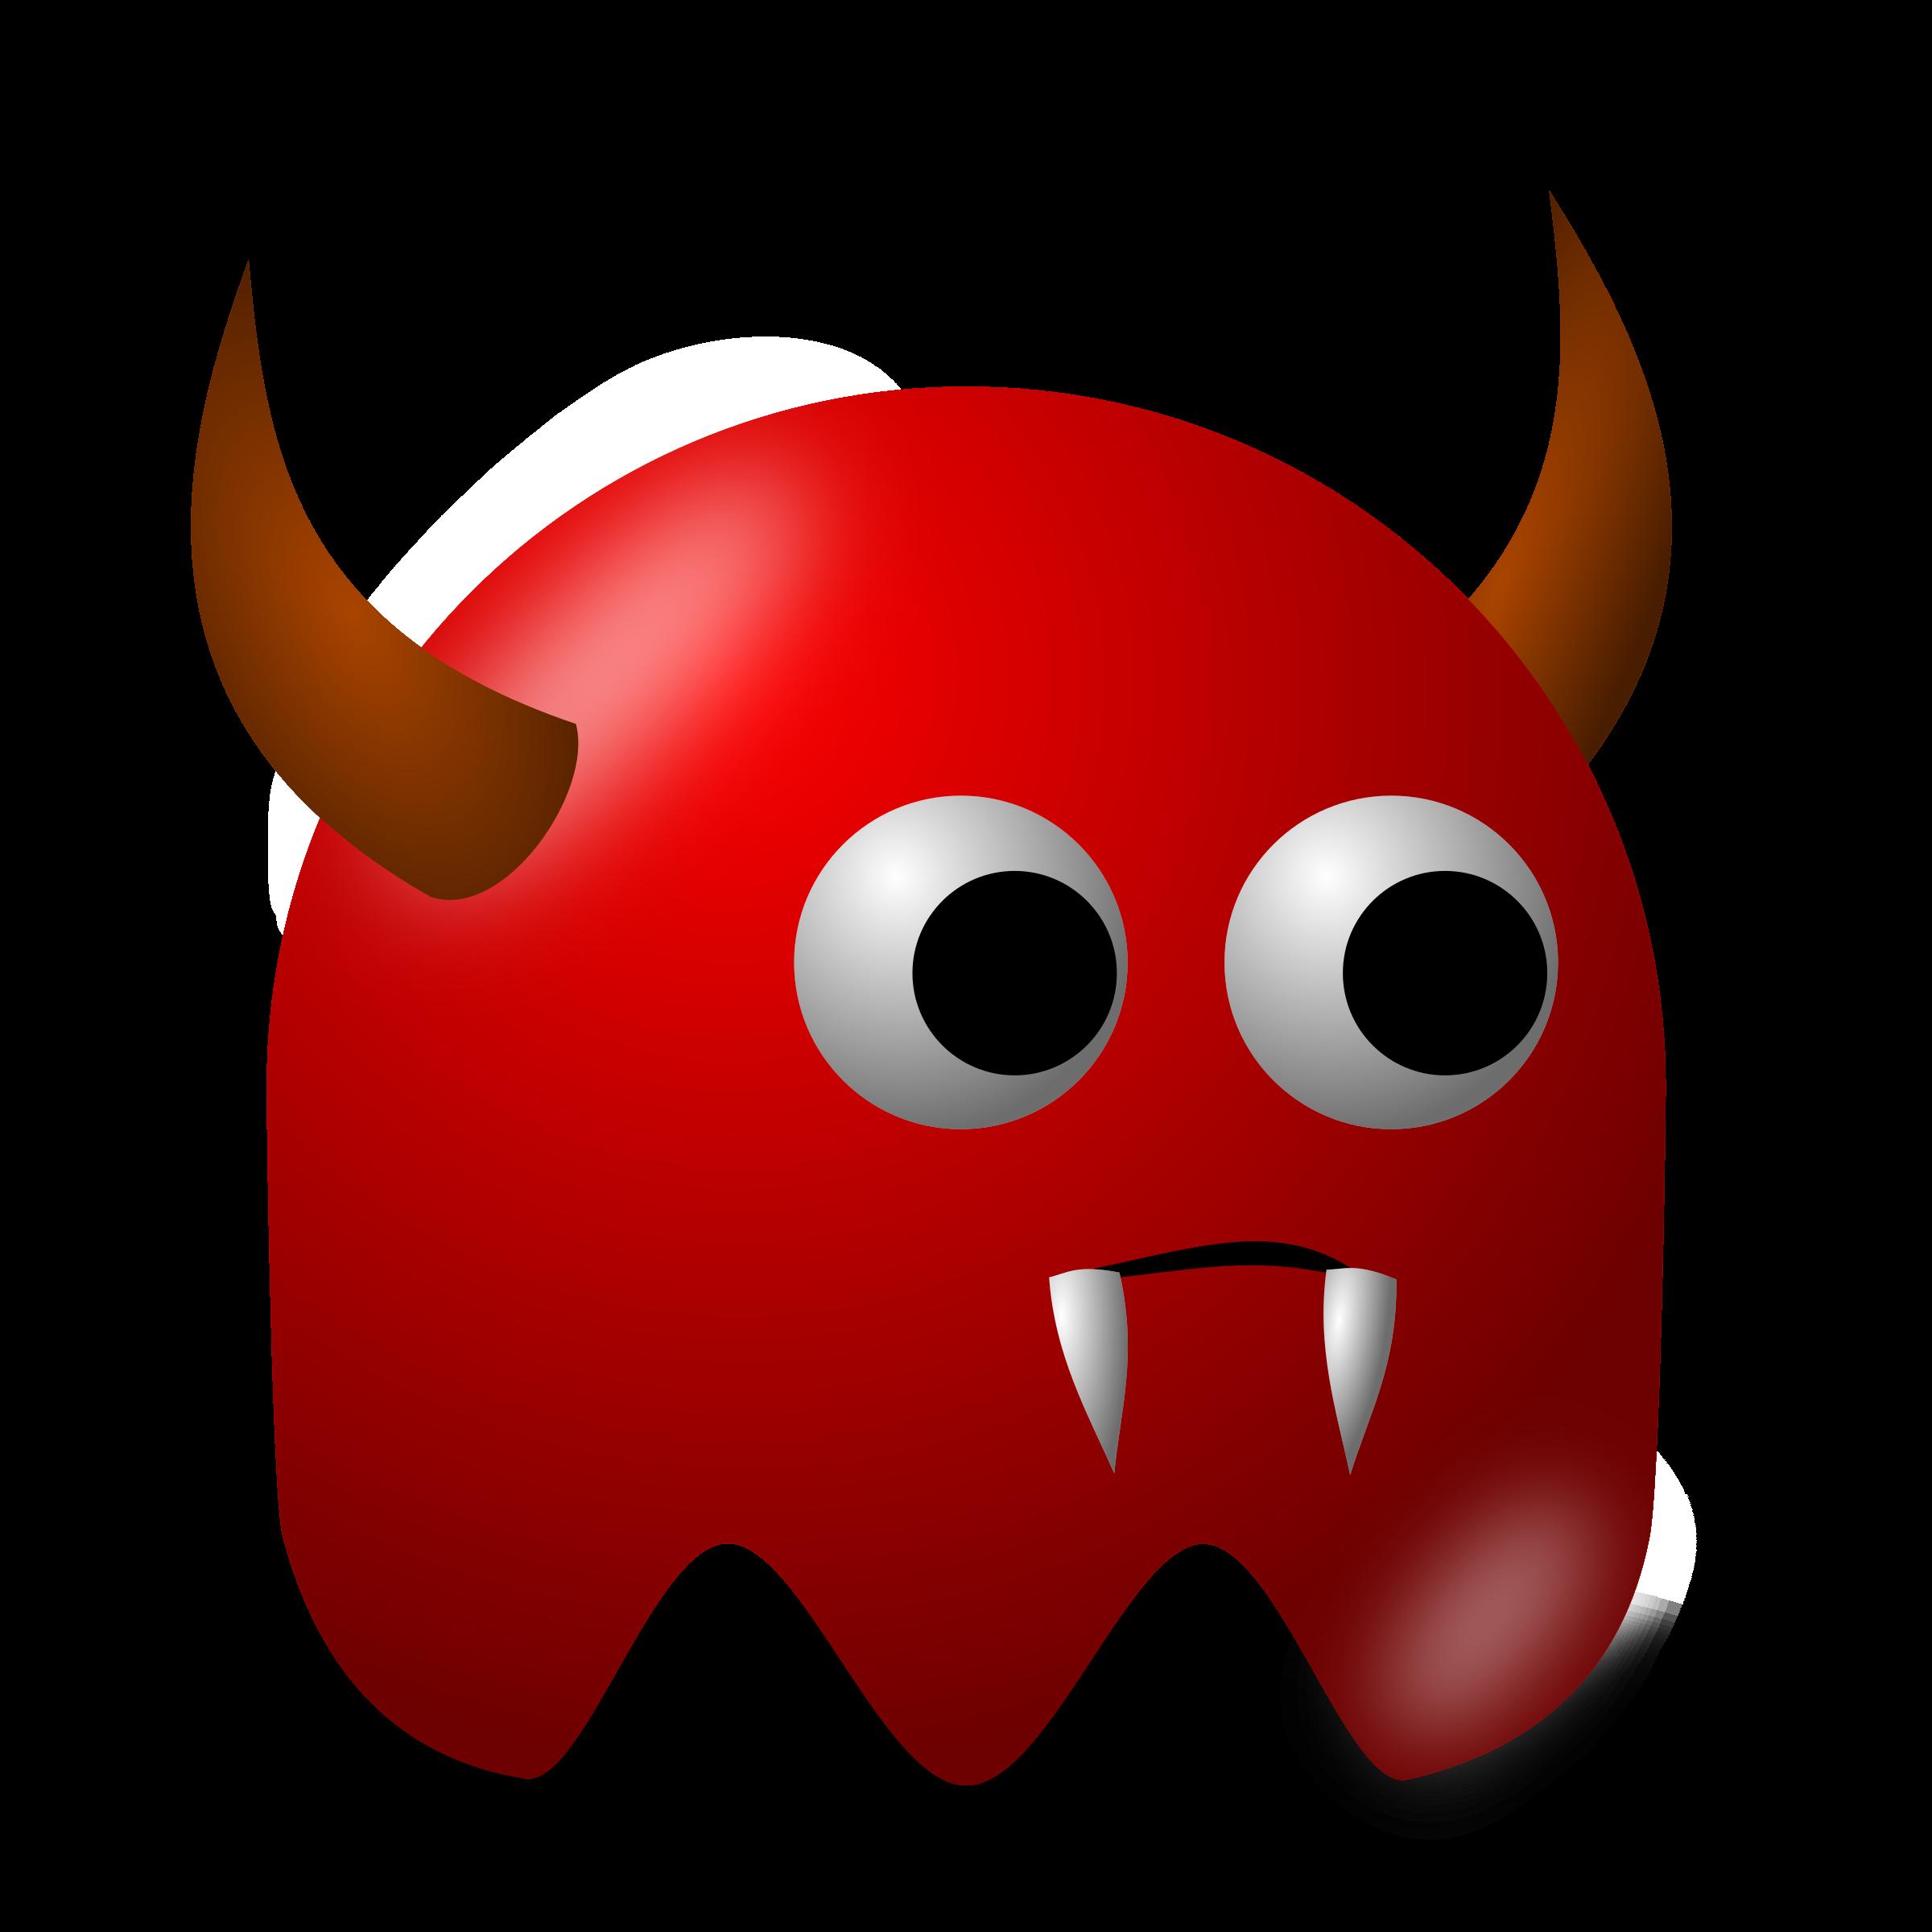 Game baddie big image. Horn clipart real devil